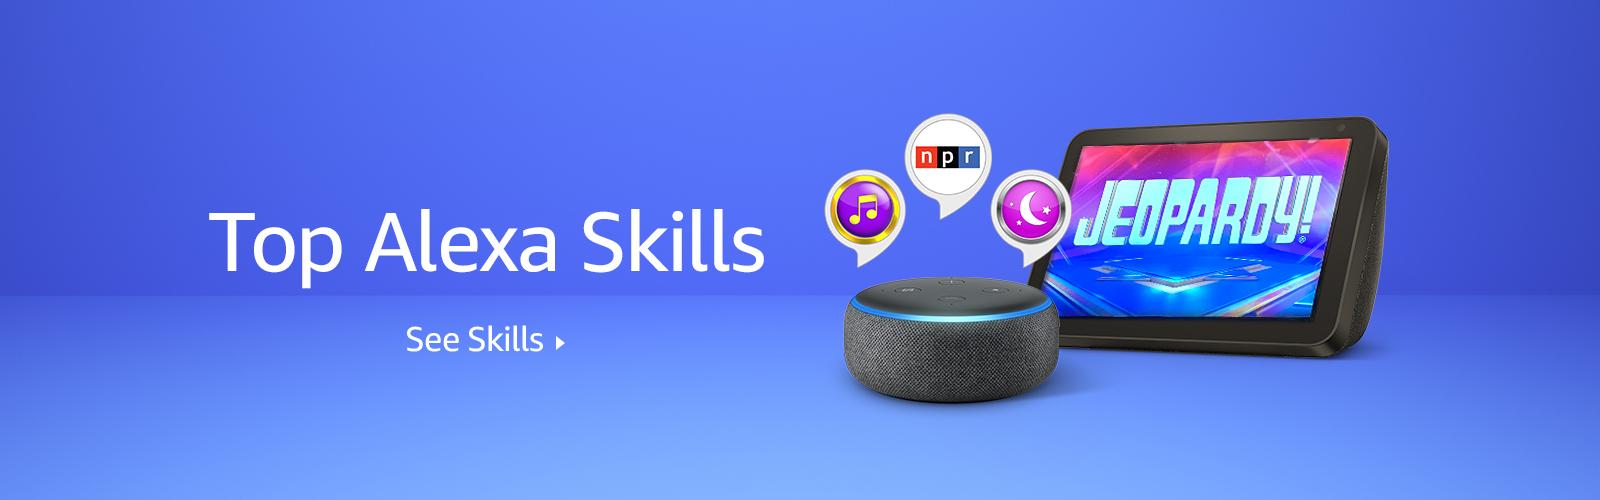 Alexa's Top Skills